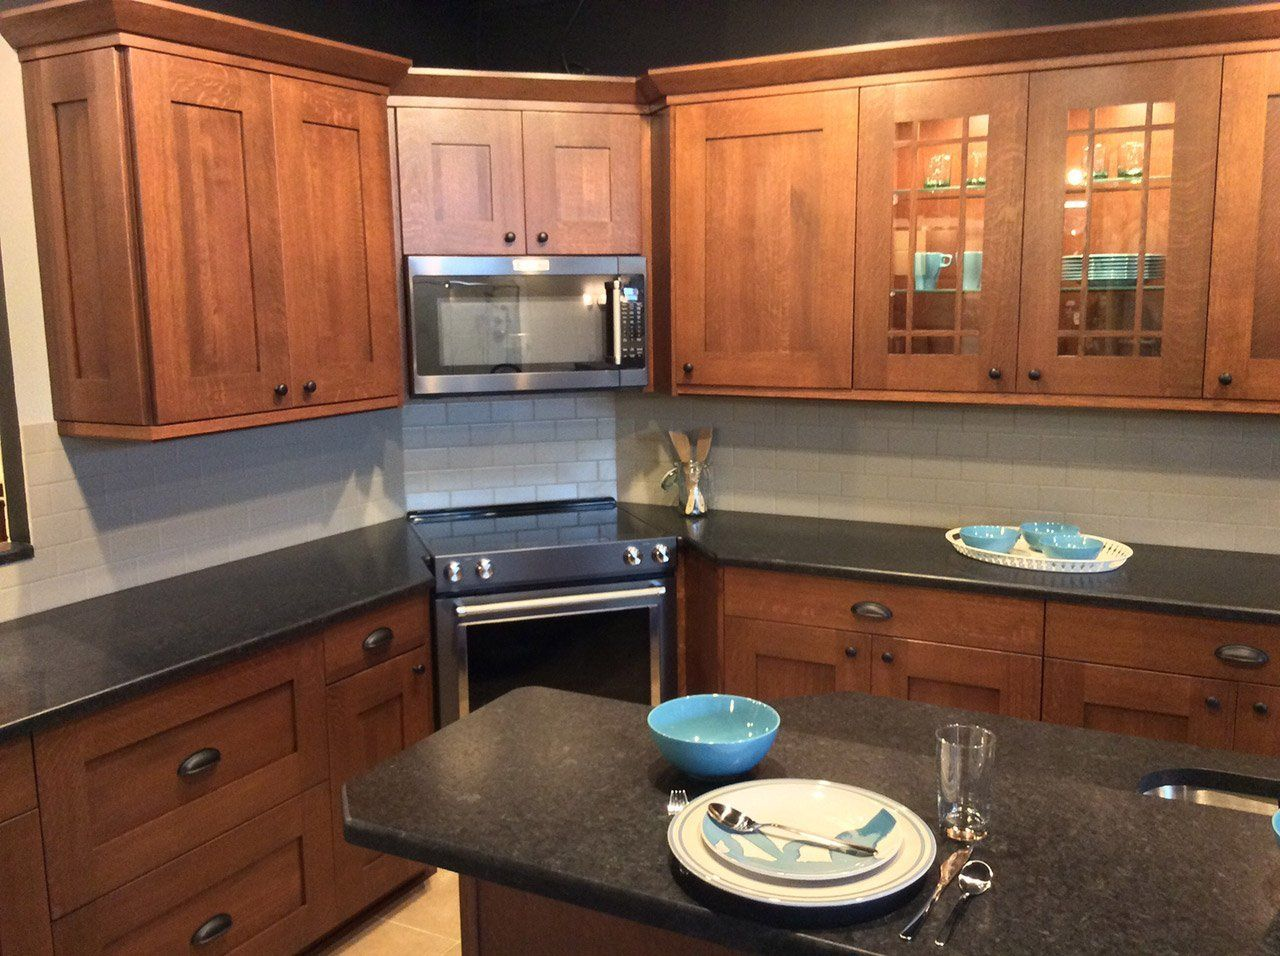 Patete Kitchen And Bath Design Center Photo Gallery Amazing